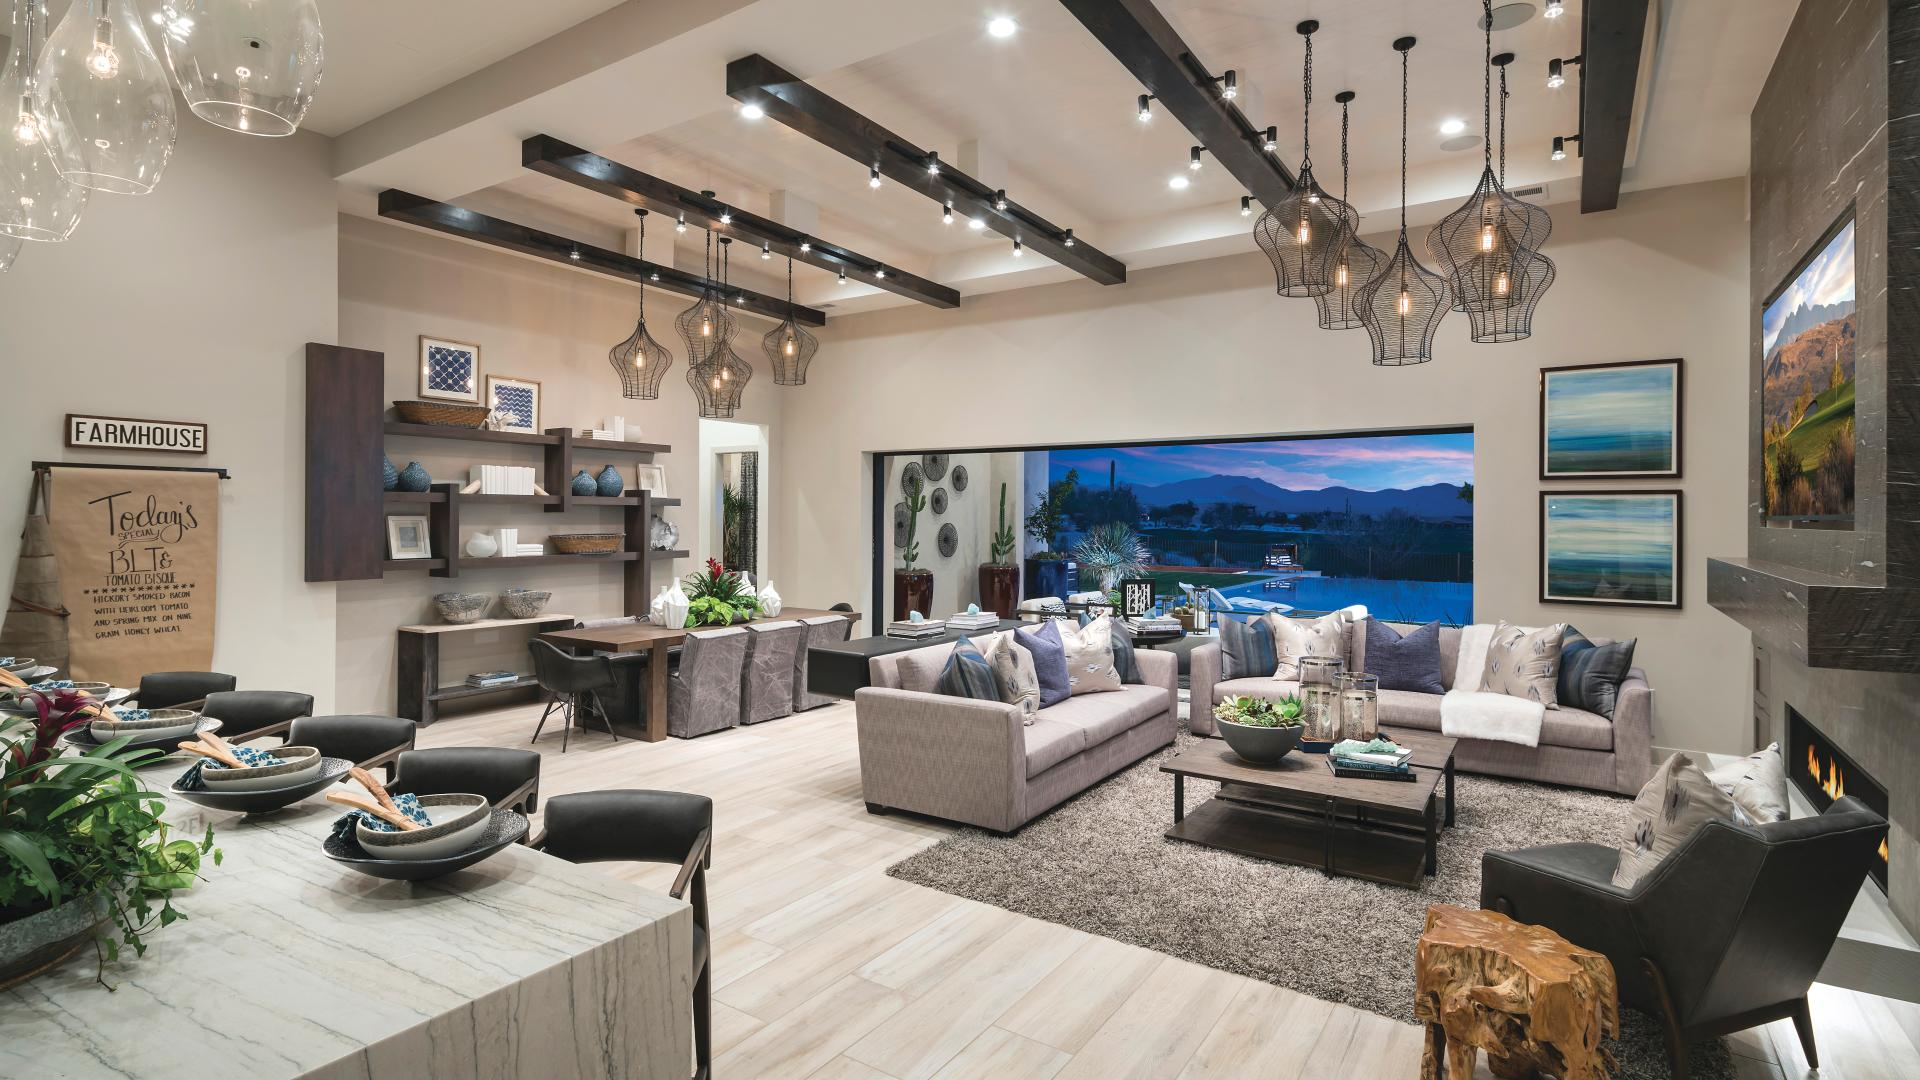 Spacious open-concept great rooms with multi-slide glass doors for indoor/outdoor living